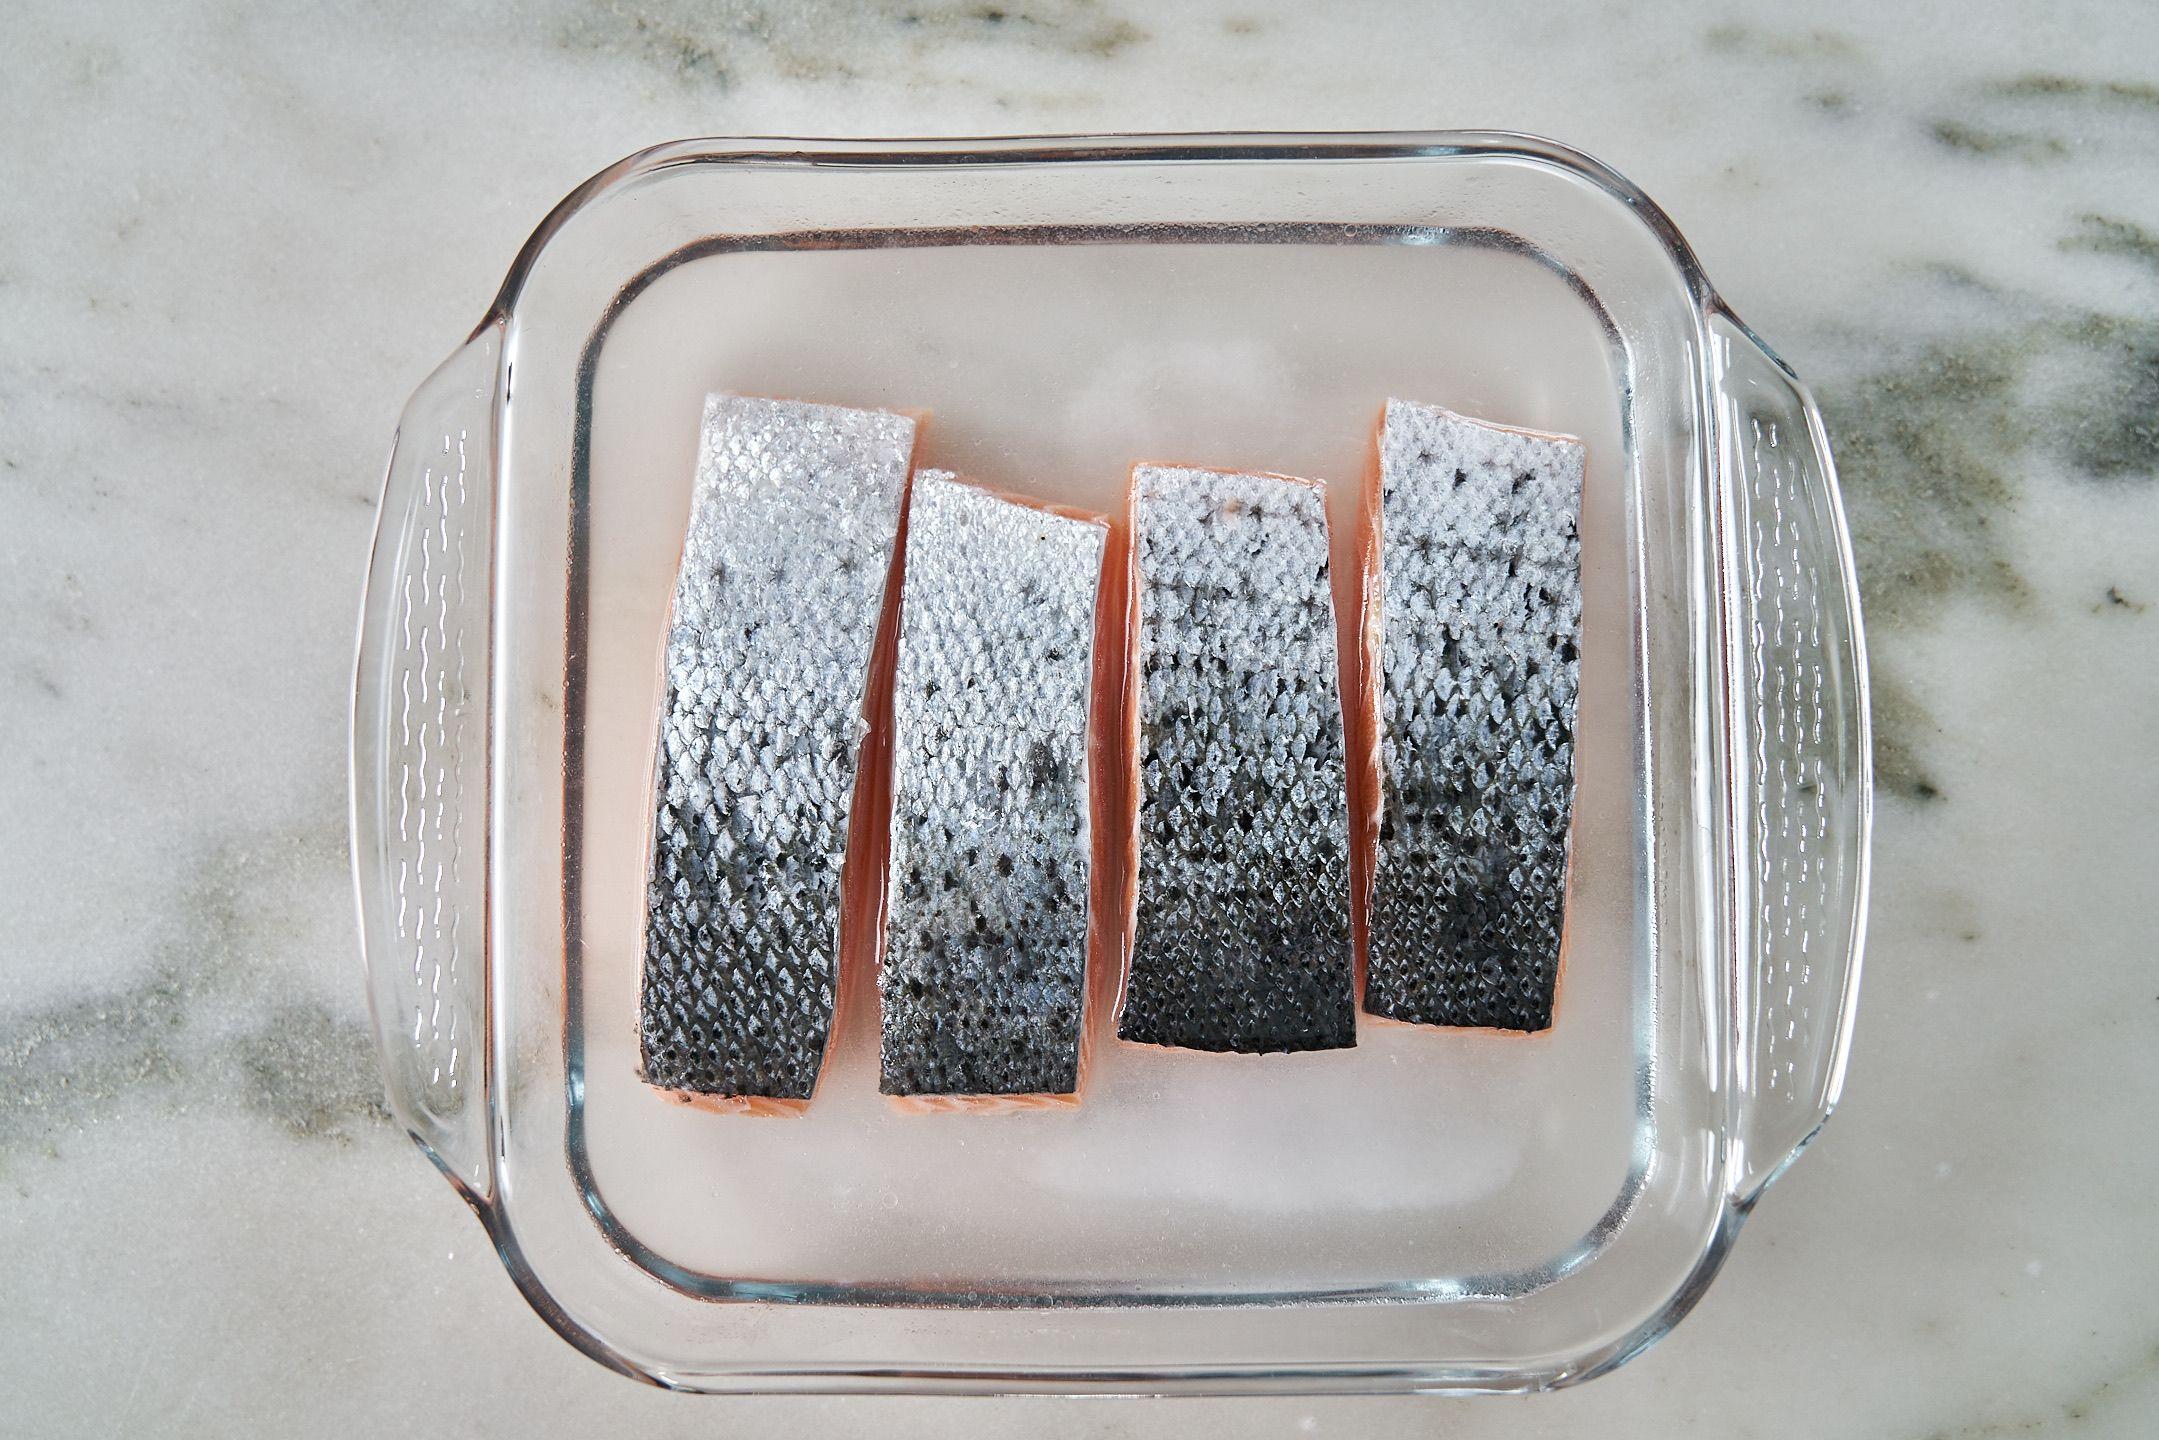 Brine salmon.